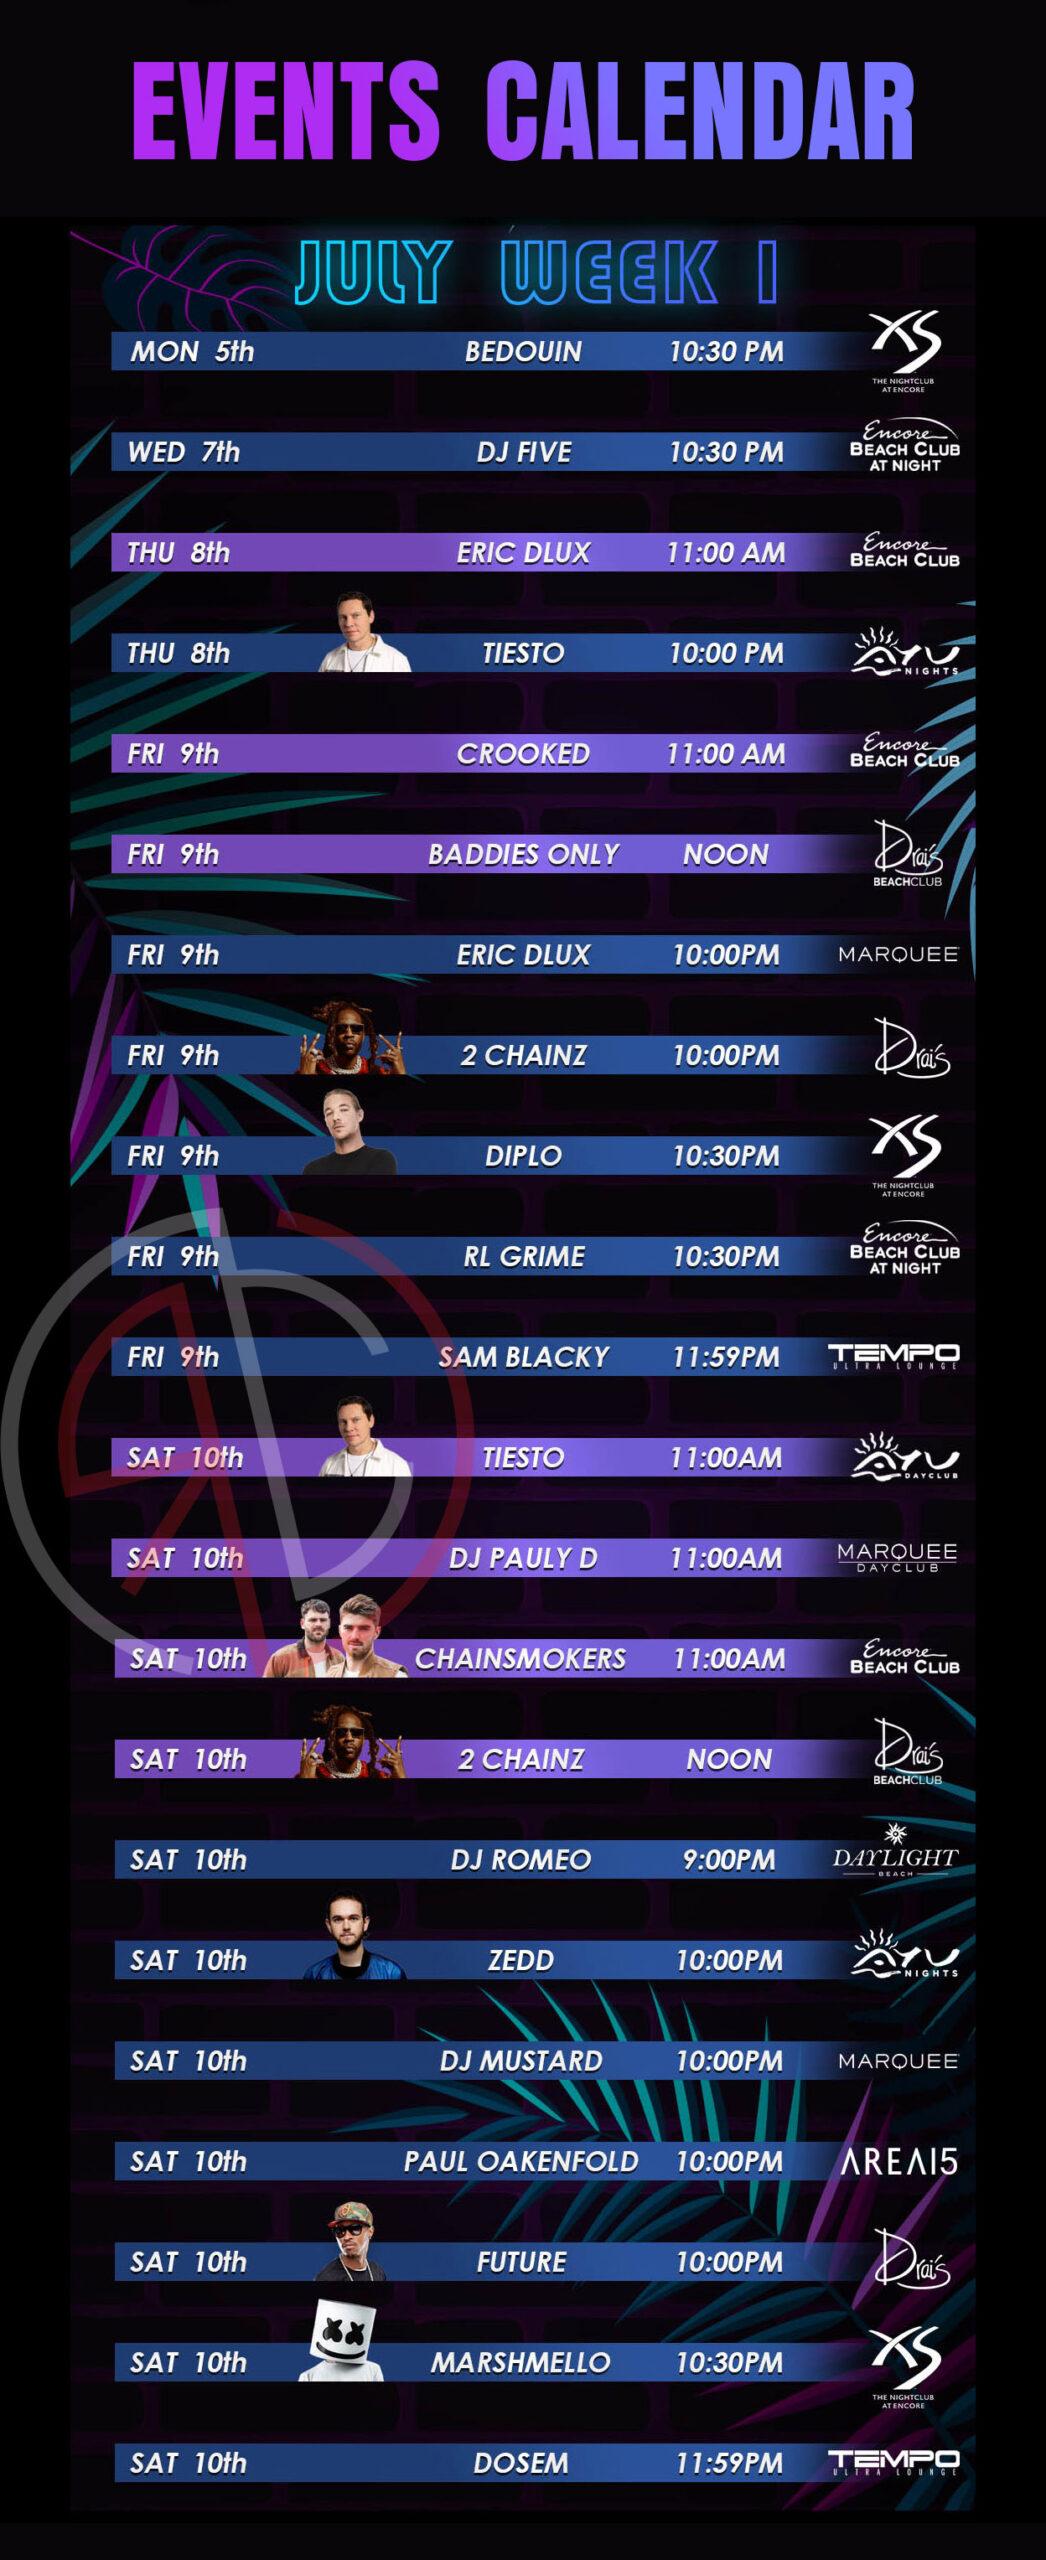 las vegas nightclub and dayclub july 2021 week 1 events calendar